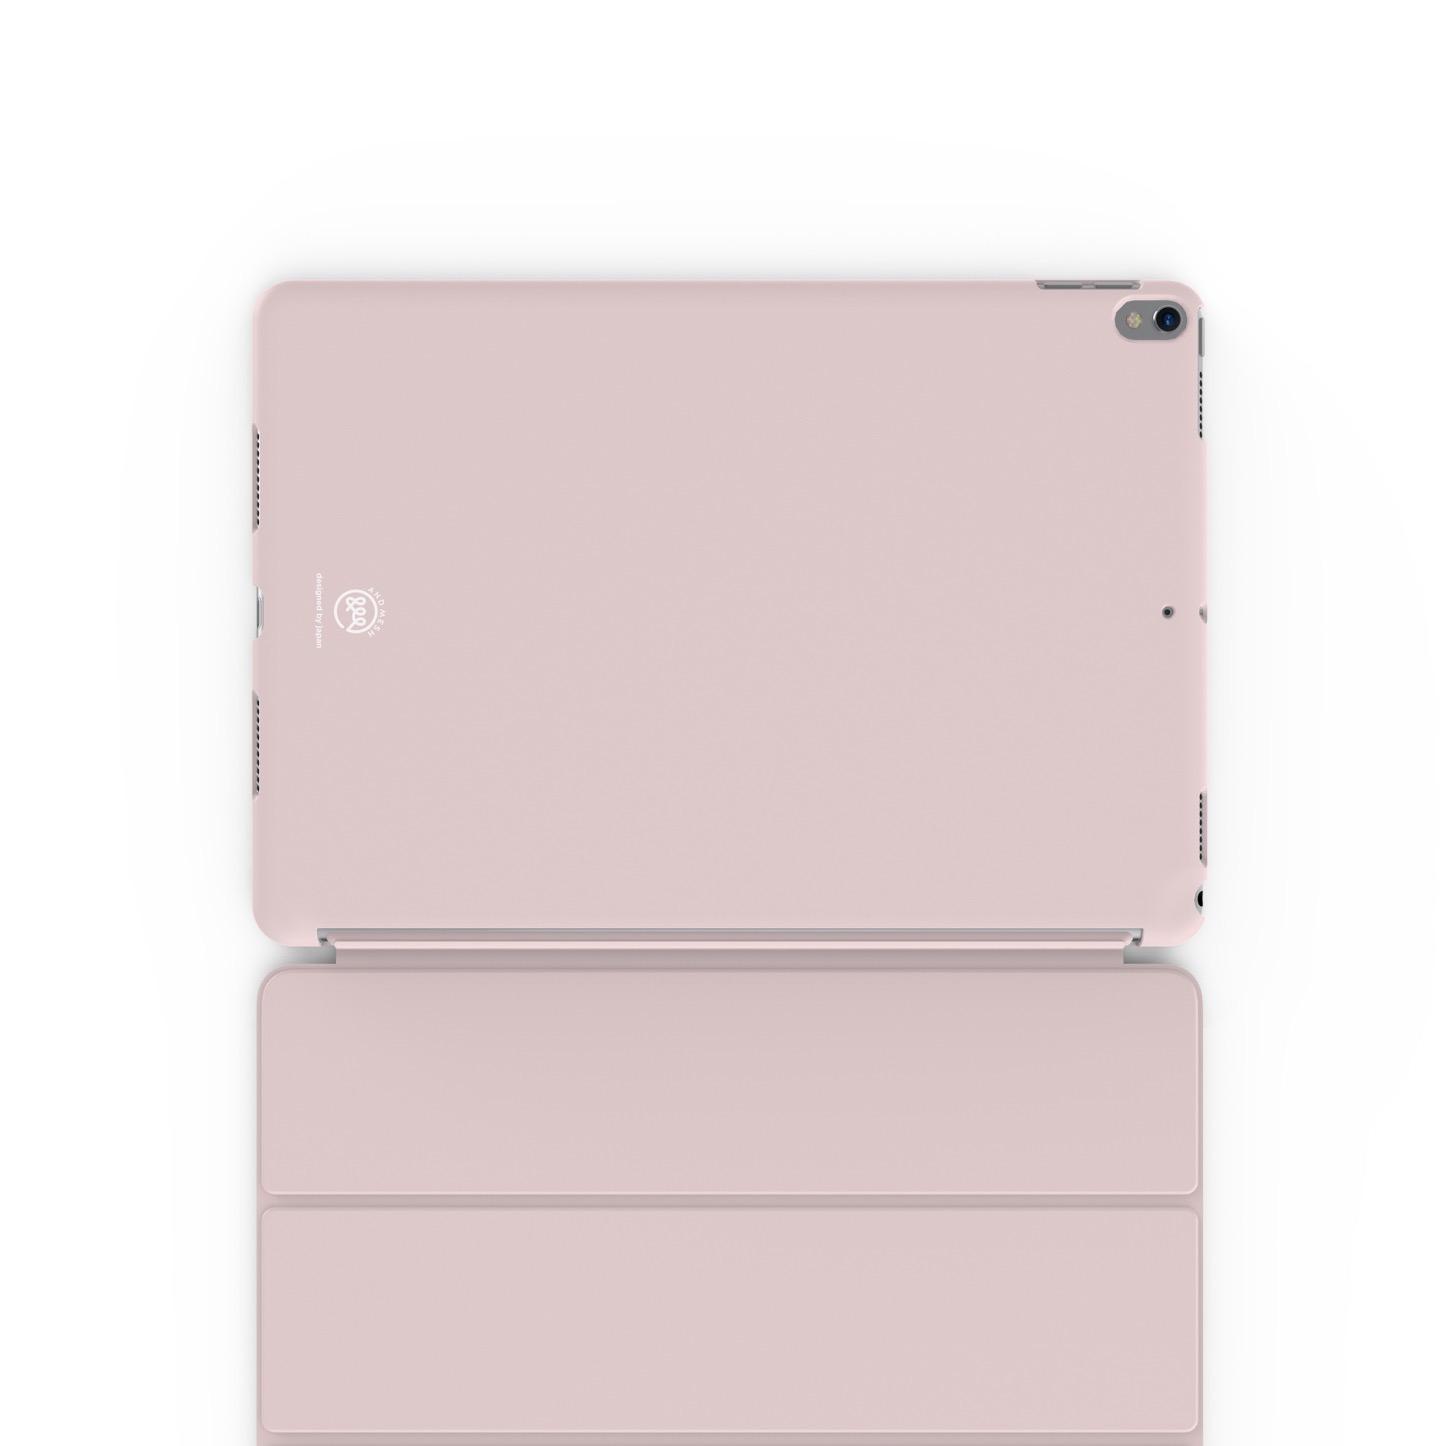 AndMesh-iPad-Pro-10_5-11.jpg